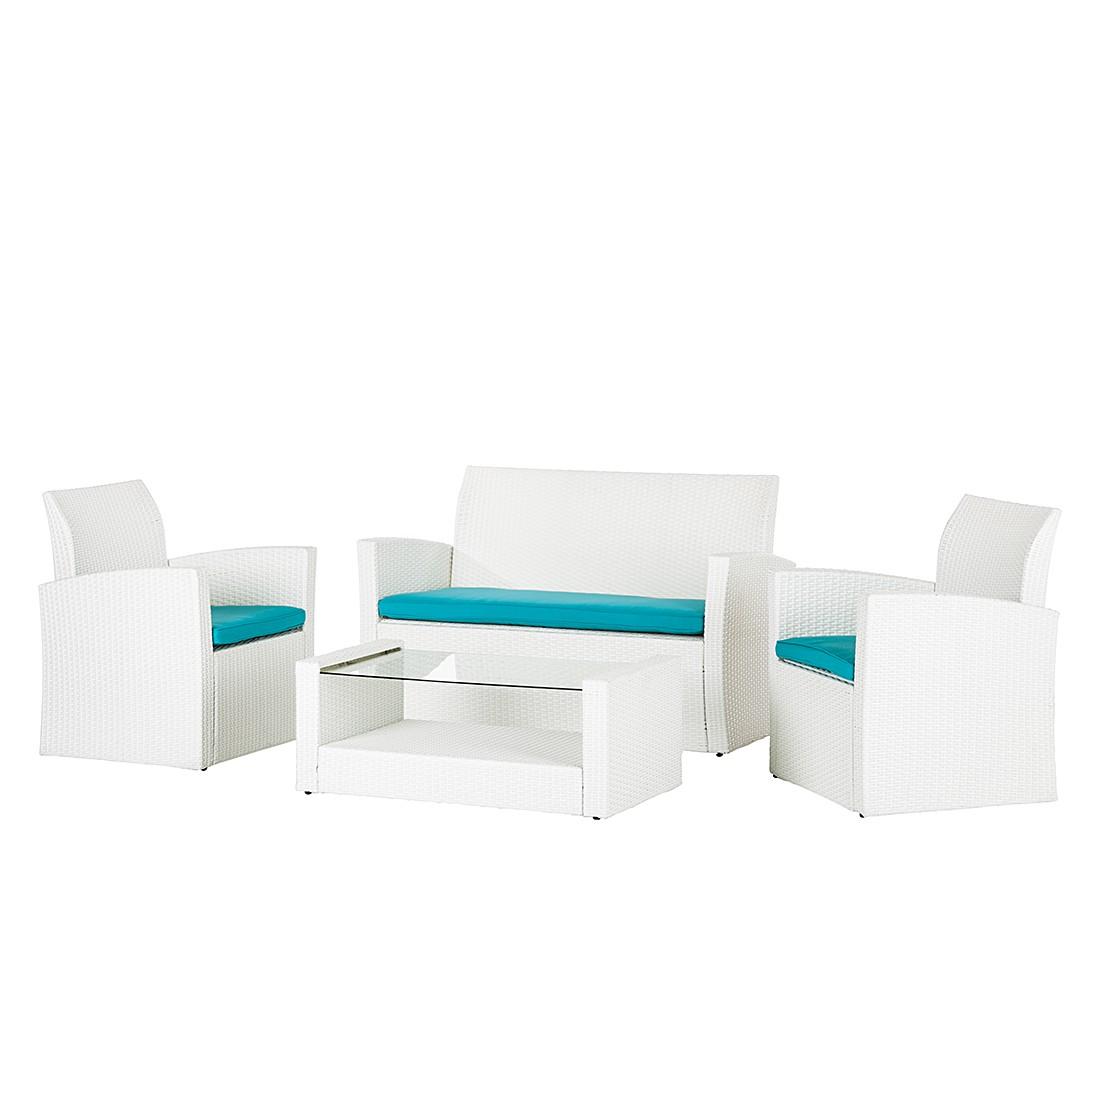 Lounge Gruppe White Cloud (4-teilig) - Polyrattan/Textil Weiß, Kings Garden